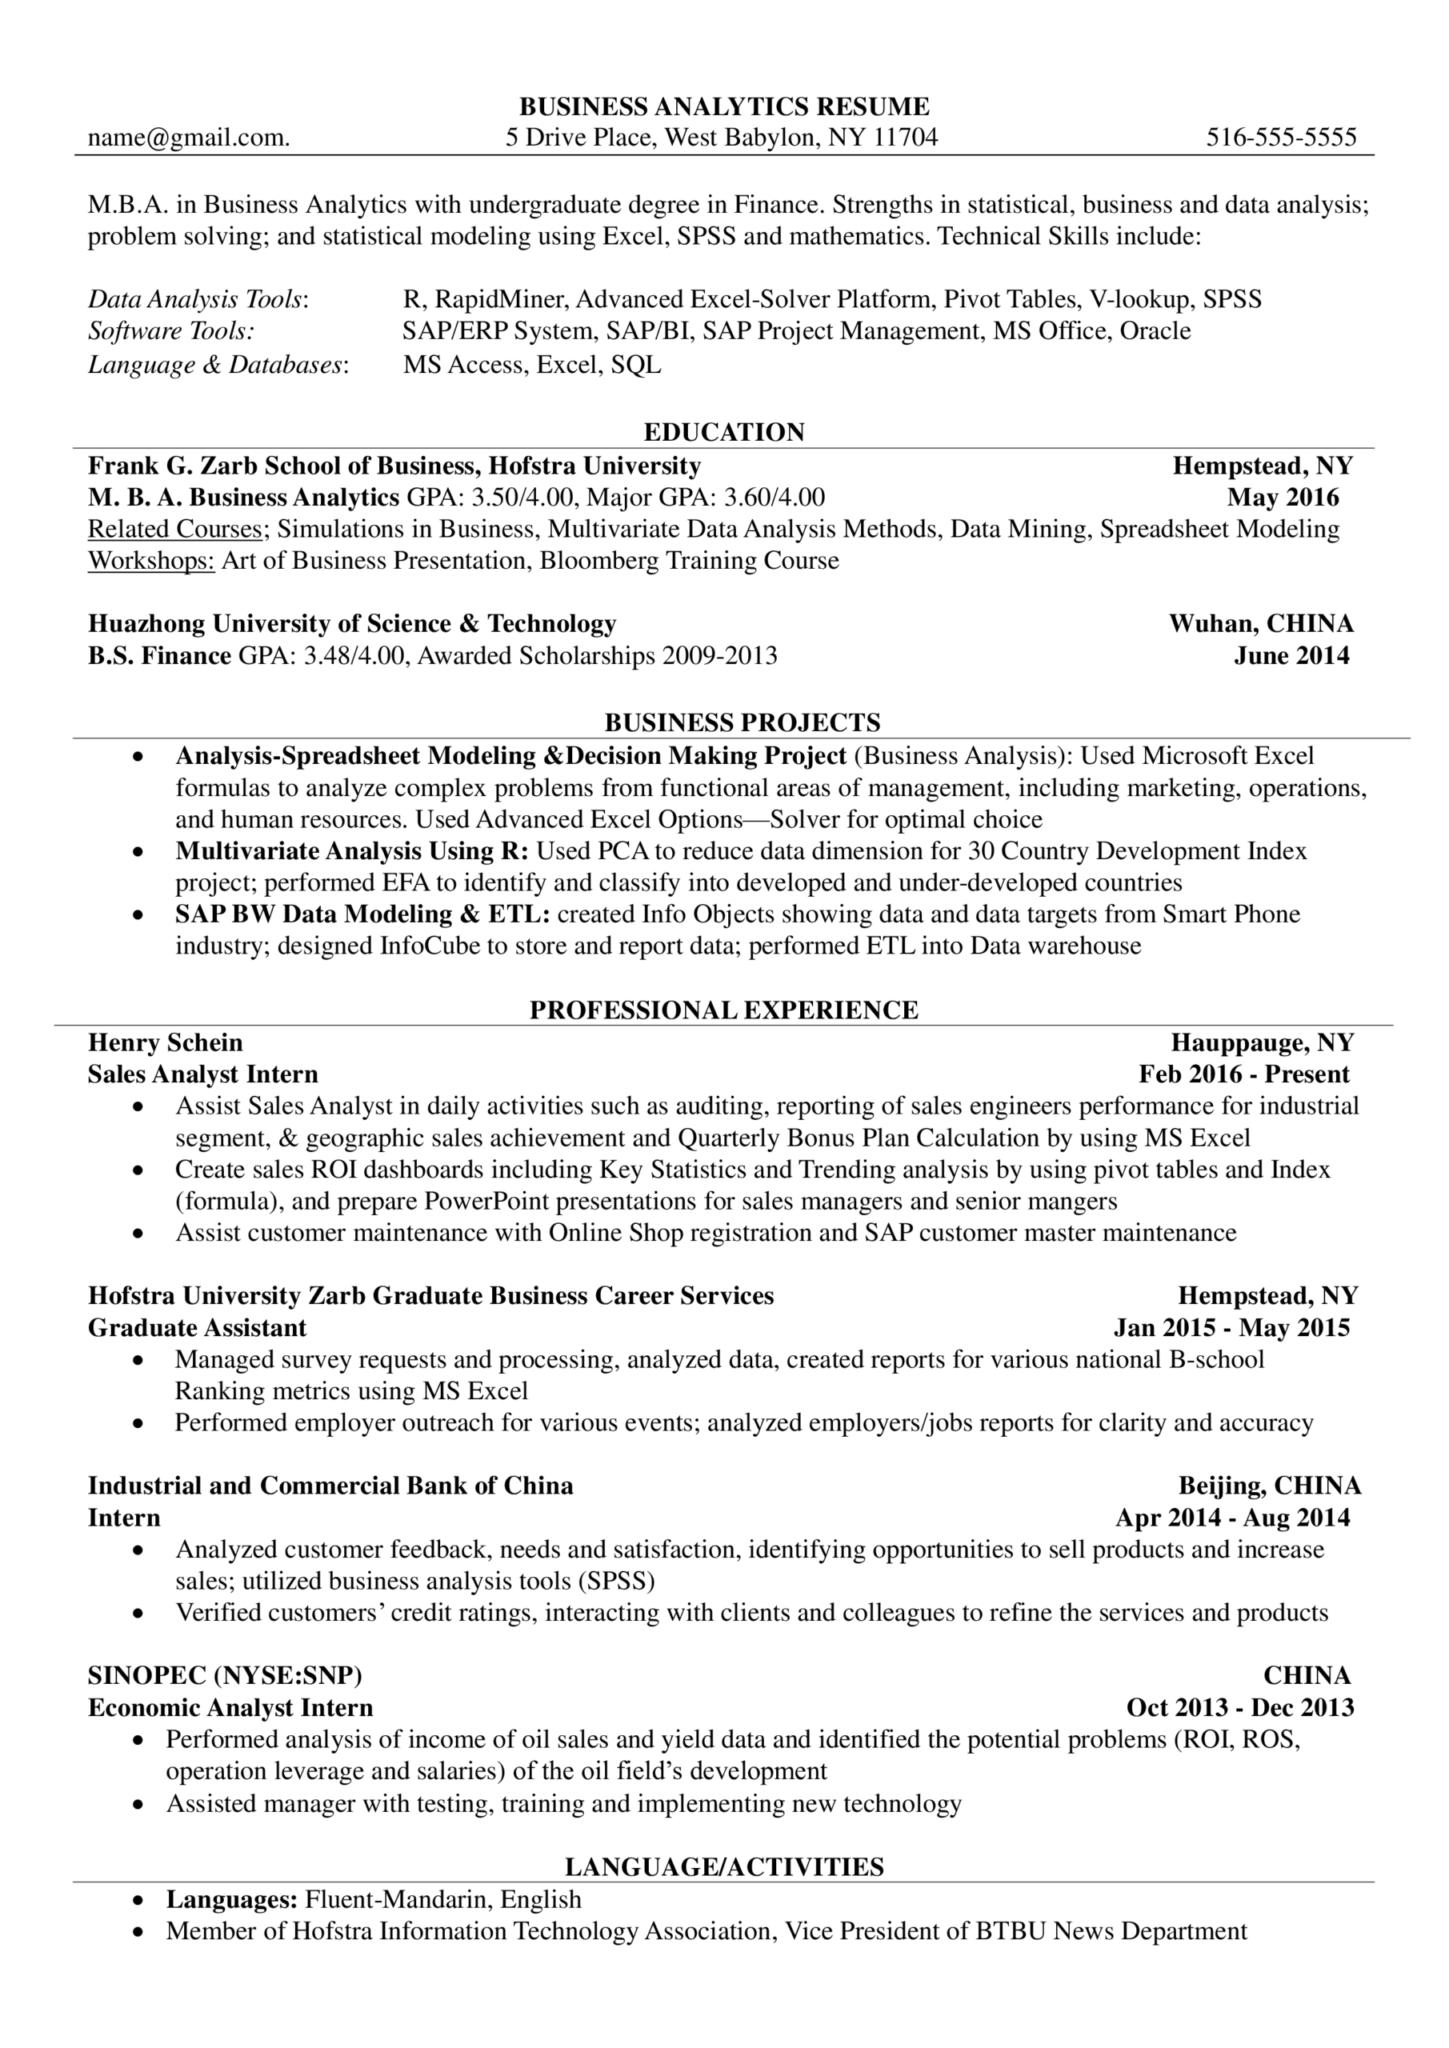 Business Analyst Internship Curriculum Vitae Templates At Regarding Business Analyst Report Te Business Analyst Curriculum Vitae Template Data Analysis Tools